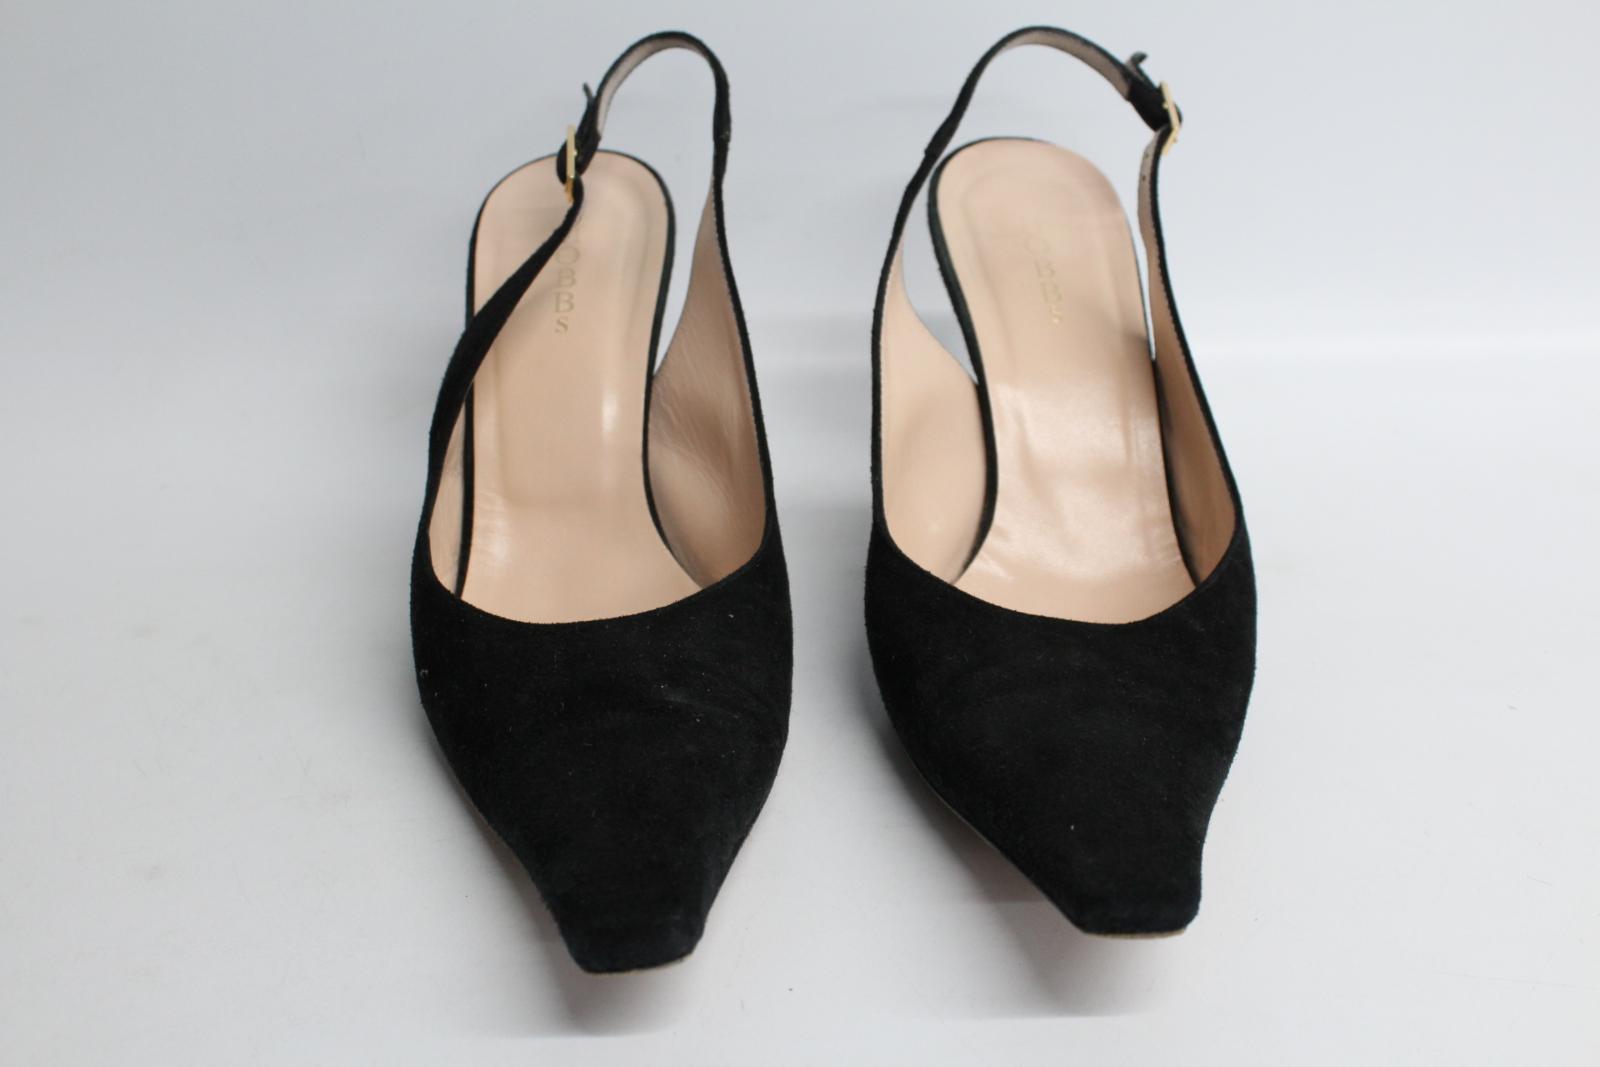 Hobbs-femmes-en-daim-noir-Sling-Arriere-bout-pointu-et-talon-aiguille-Chaussure-UK6-5-EU39-5 miniature 5